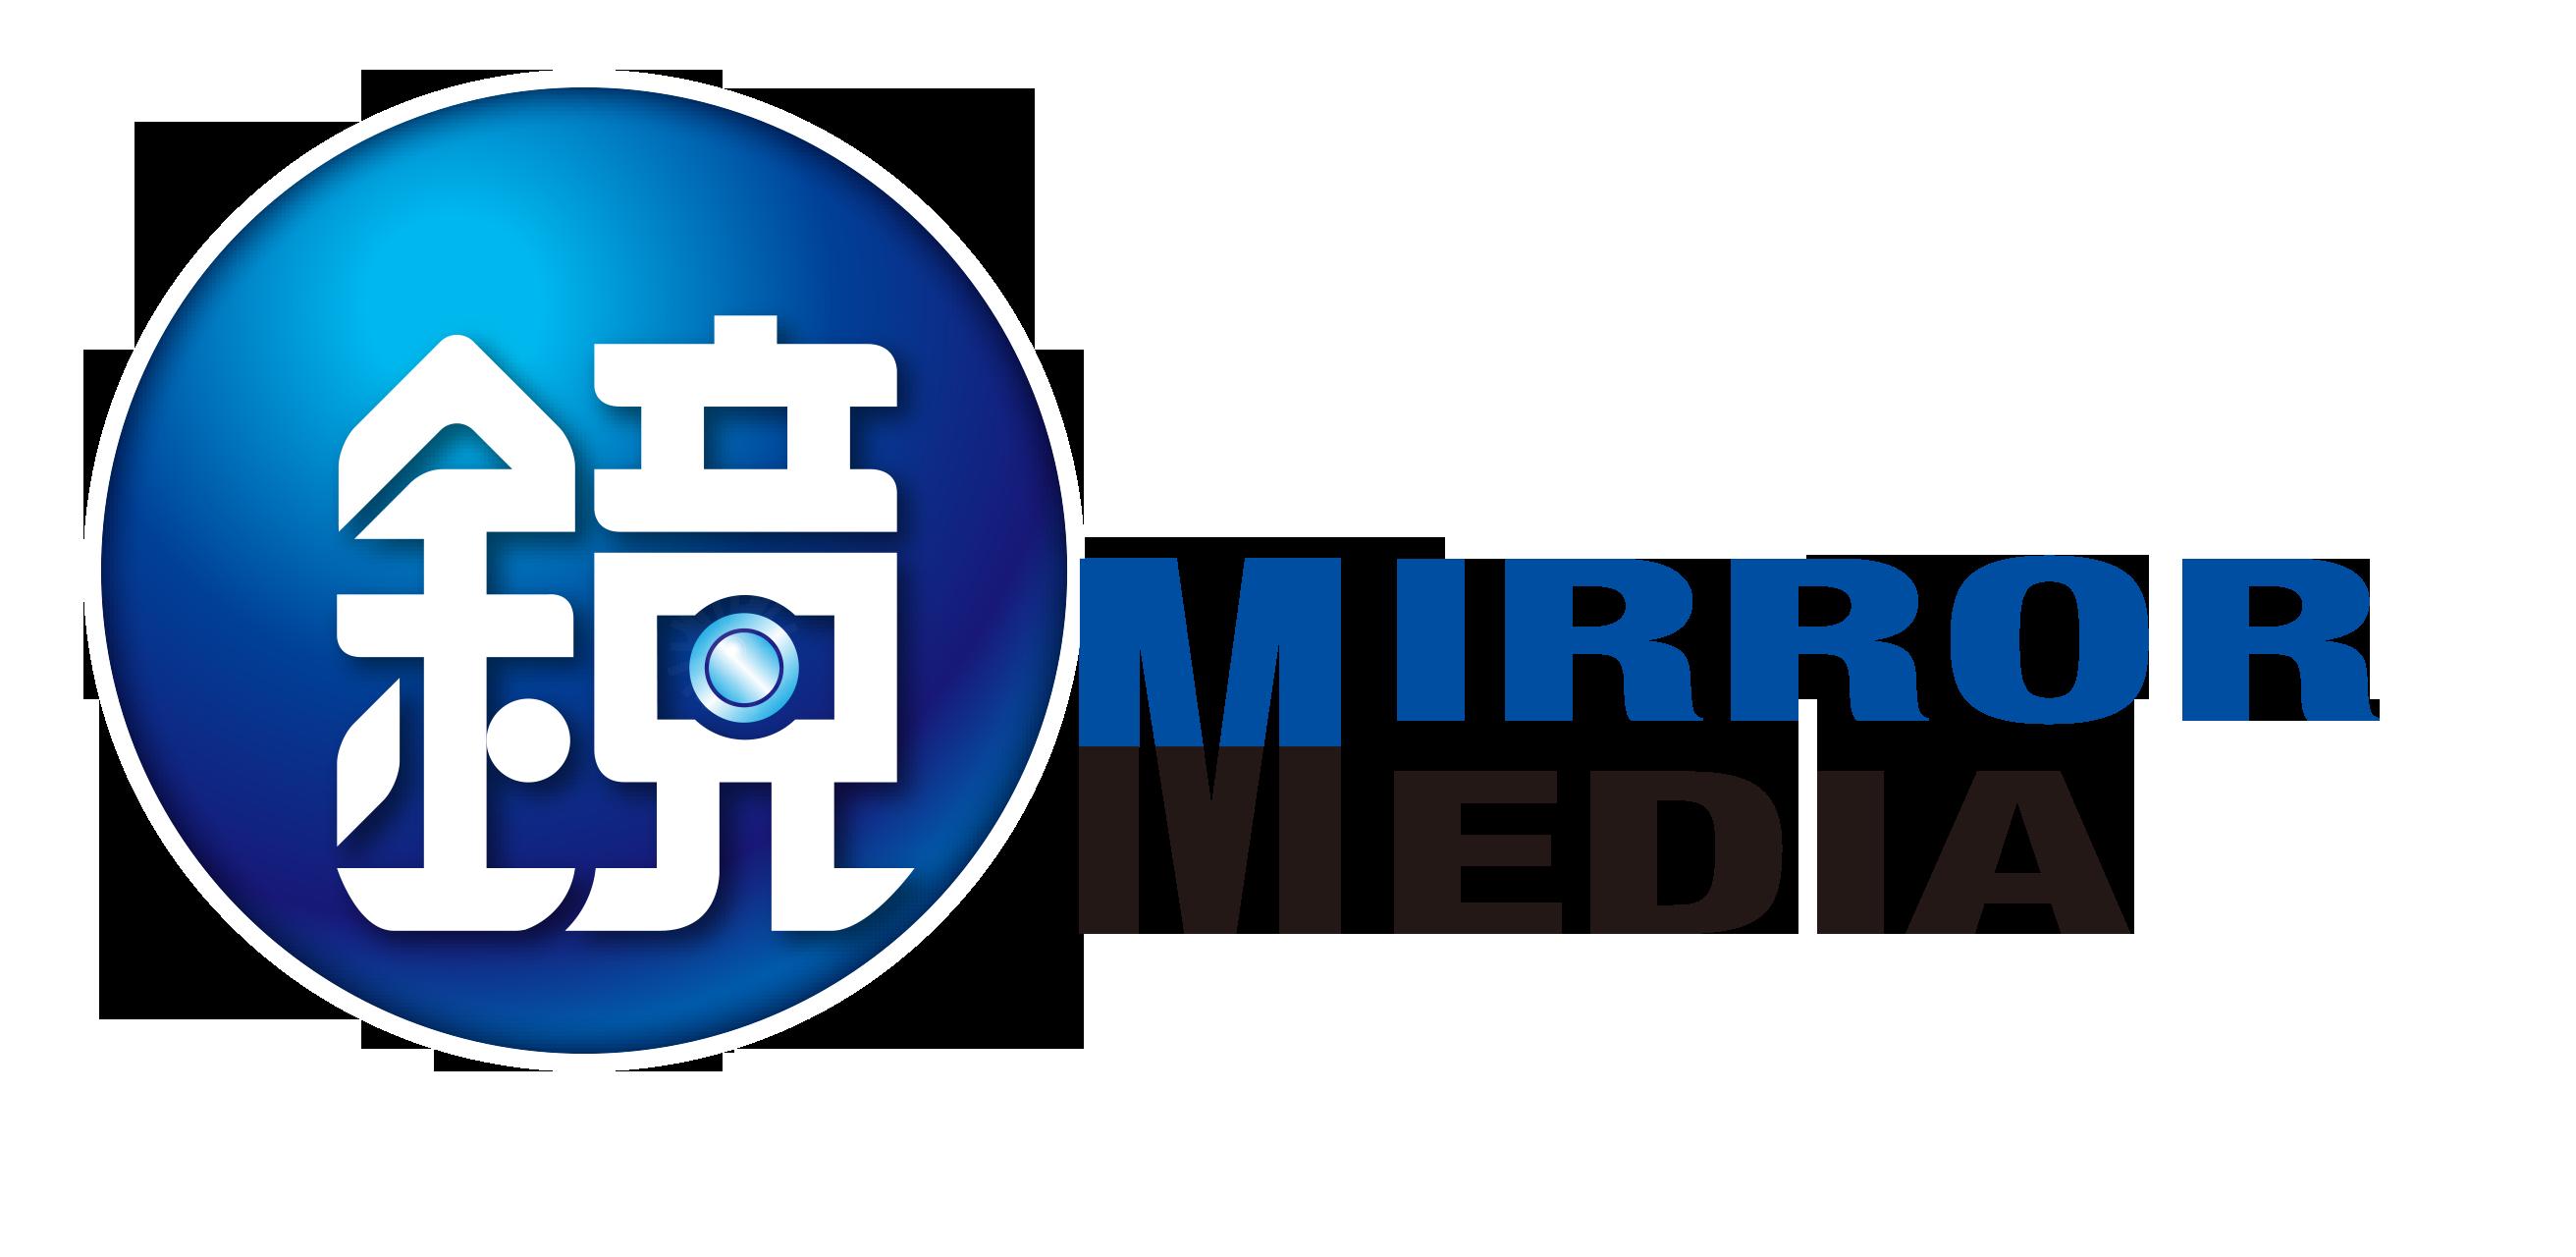 鏡周刊logo.PNG